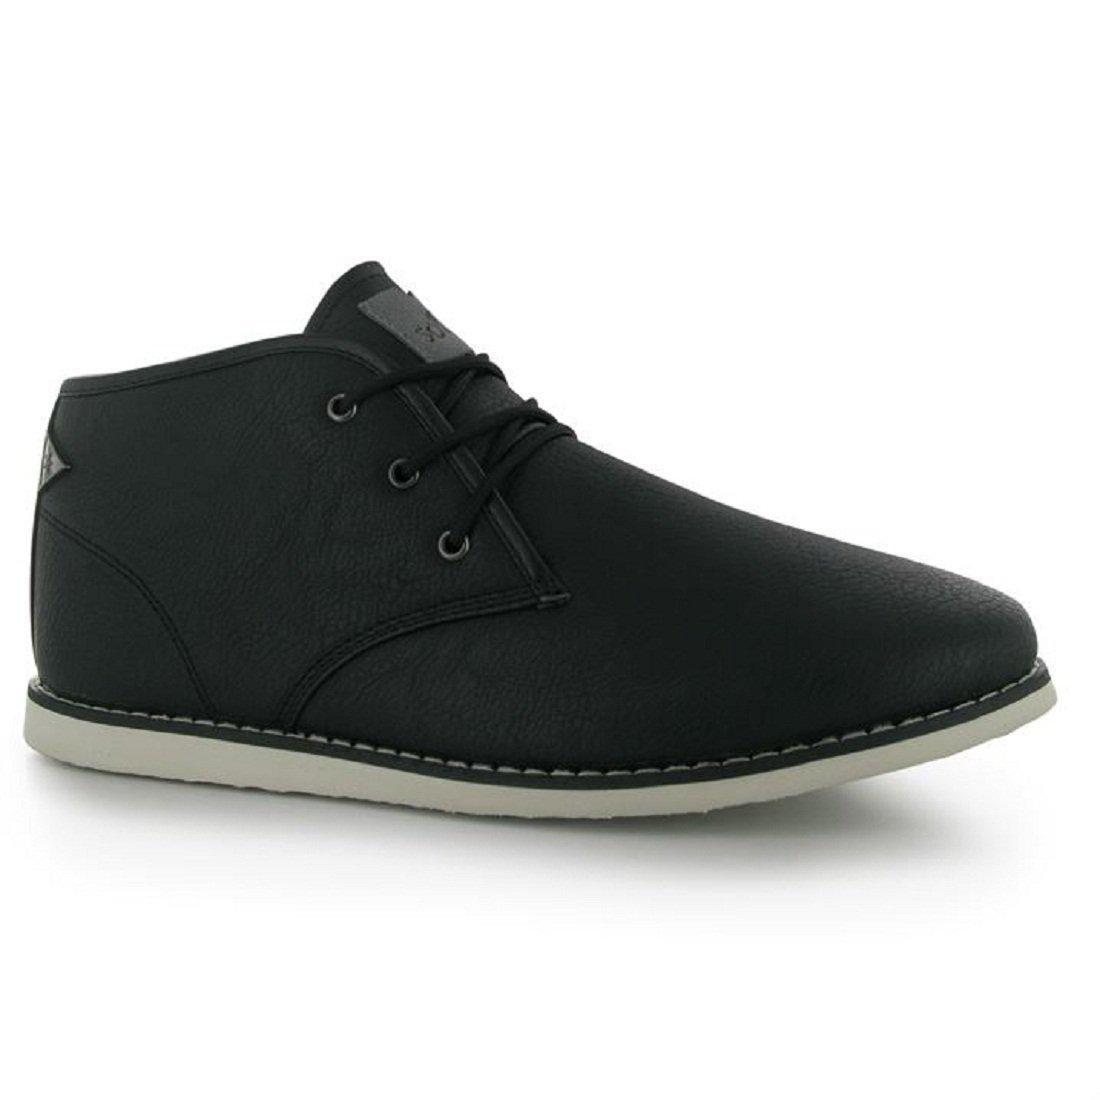 Mens Soviet White Chapel Mid Boots Shoes Black (UK 9.5 / US 10)